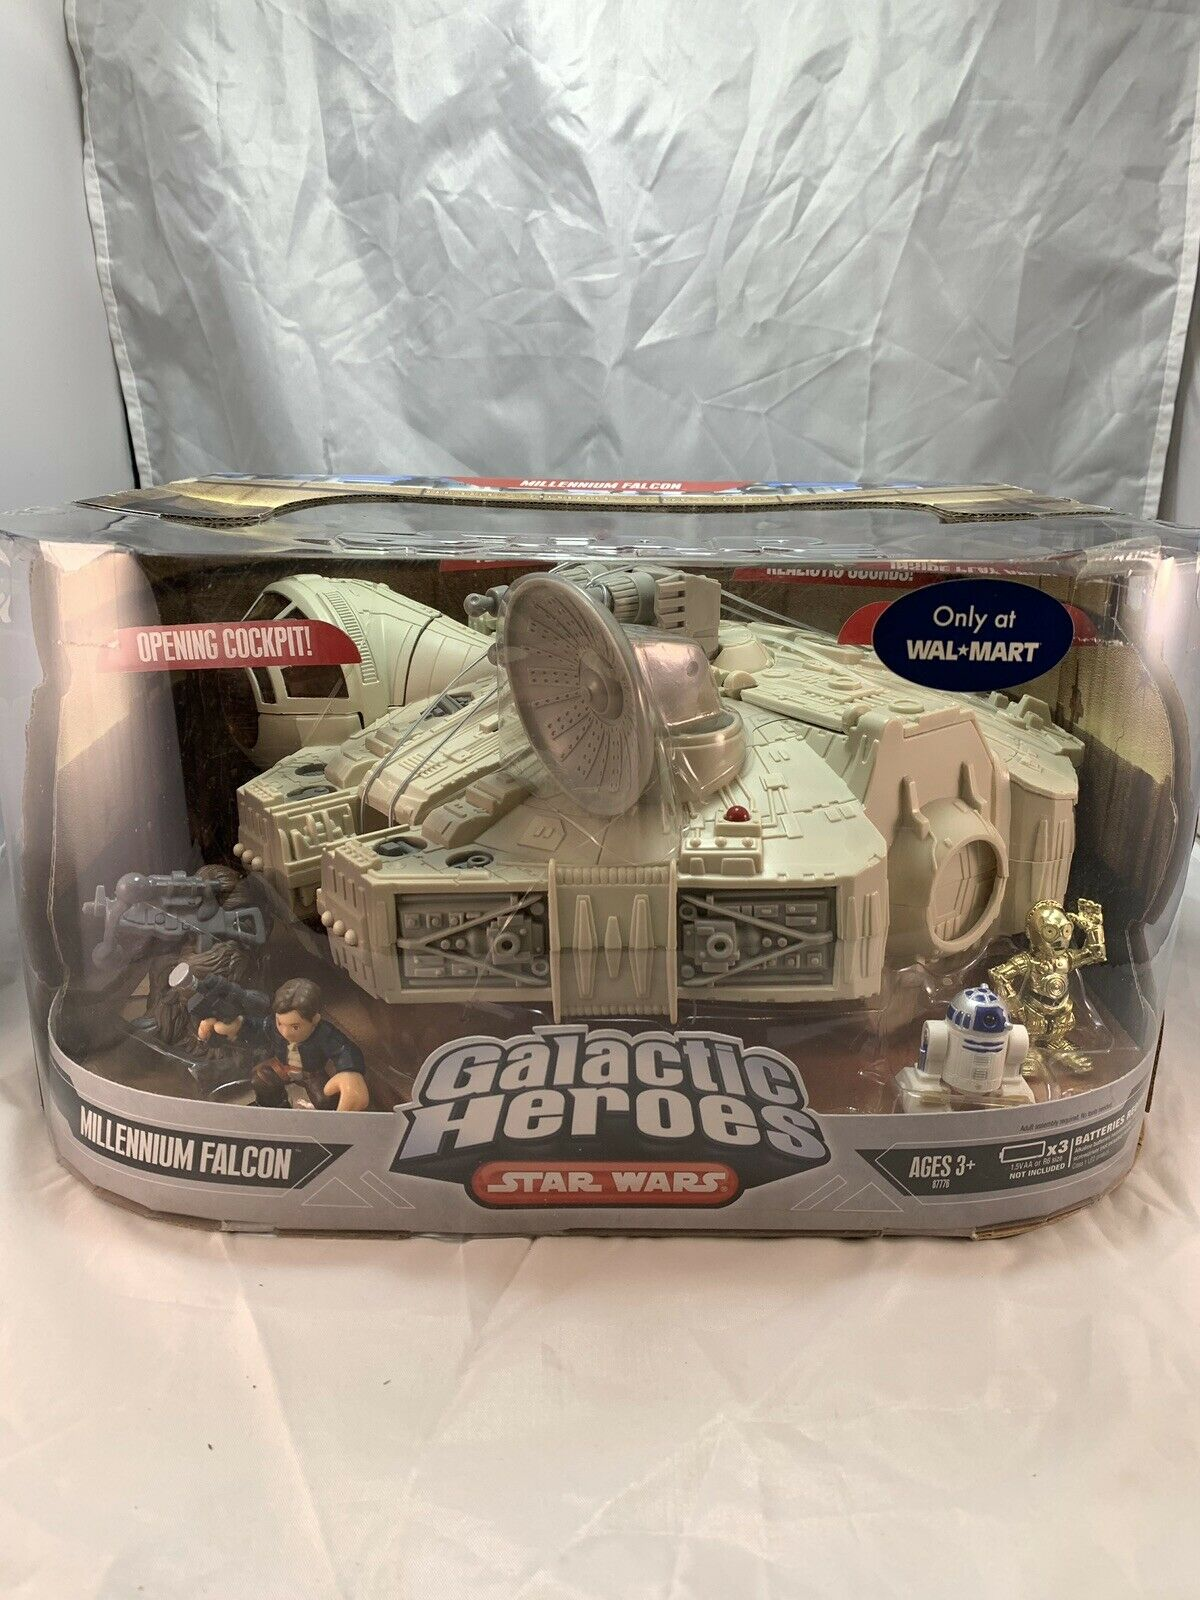 Star Wars Galactic Heroes Millennium Falcon Walmart Exclusive